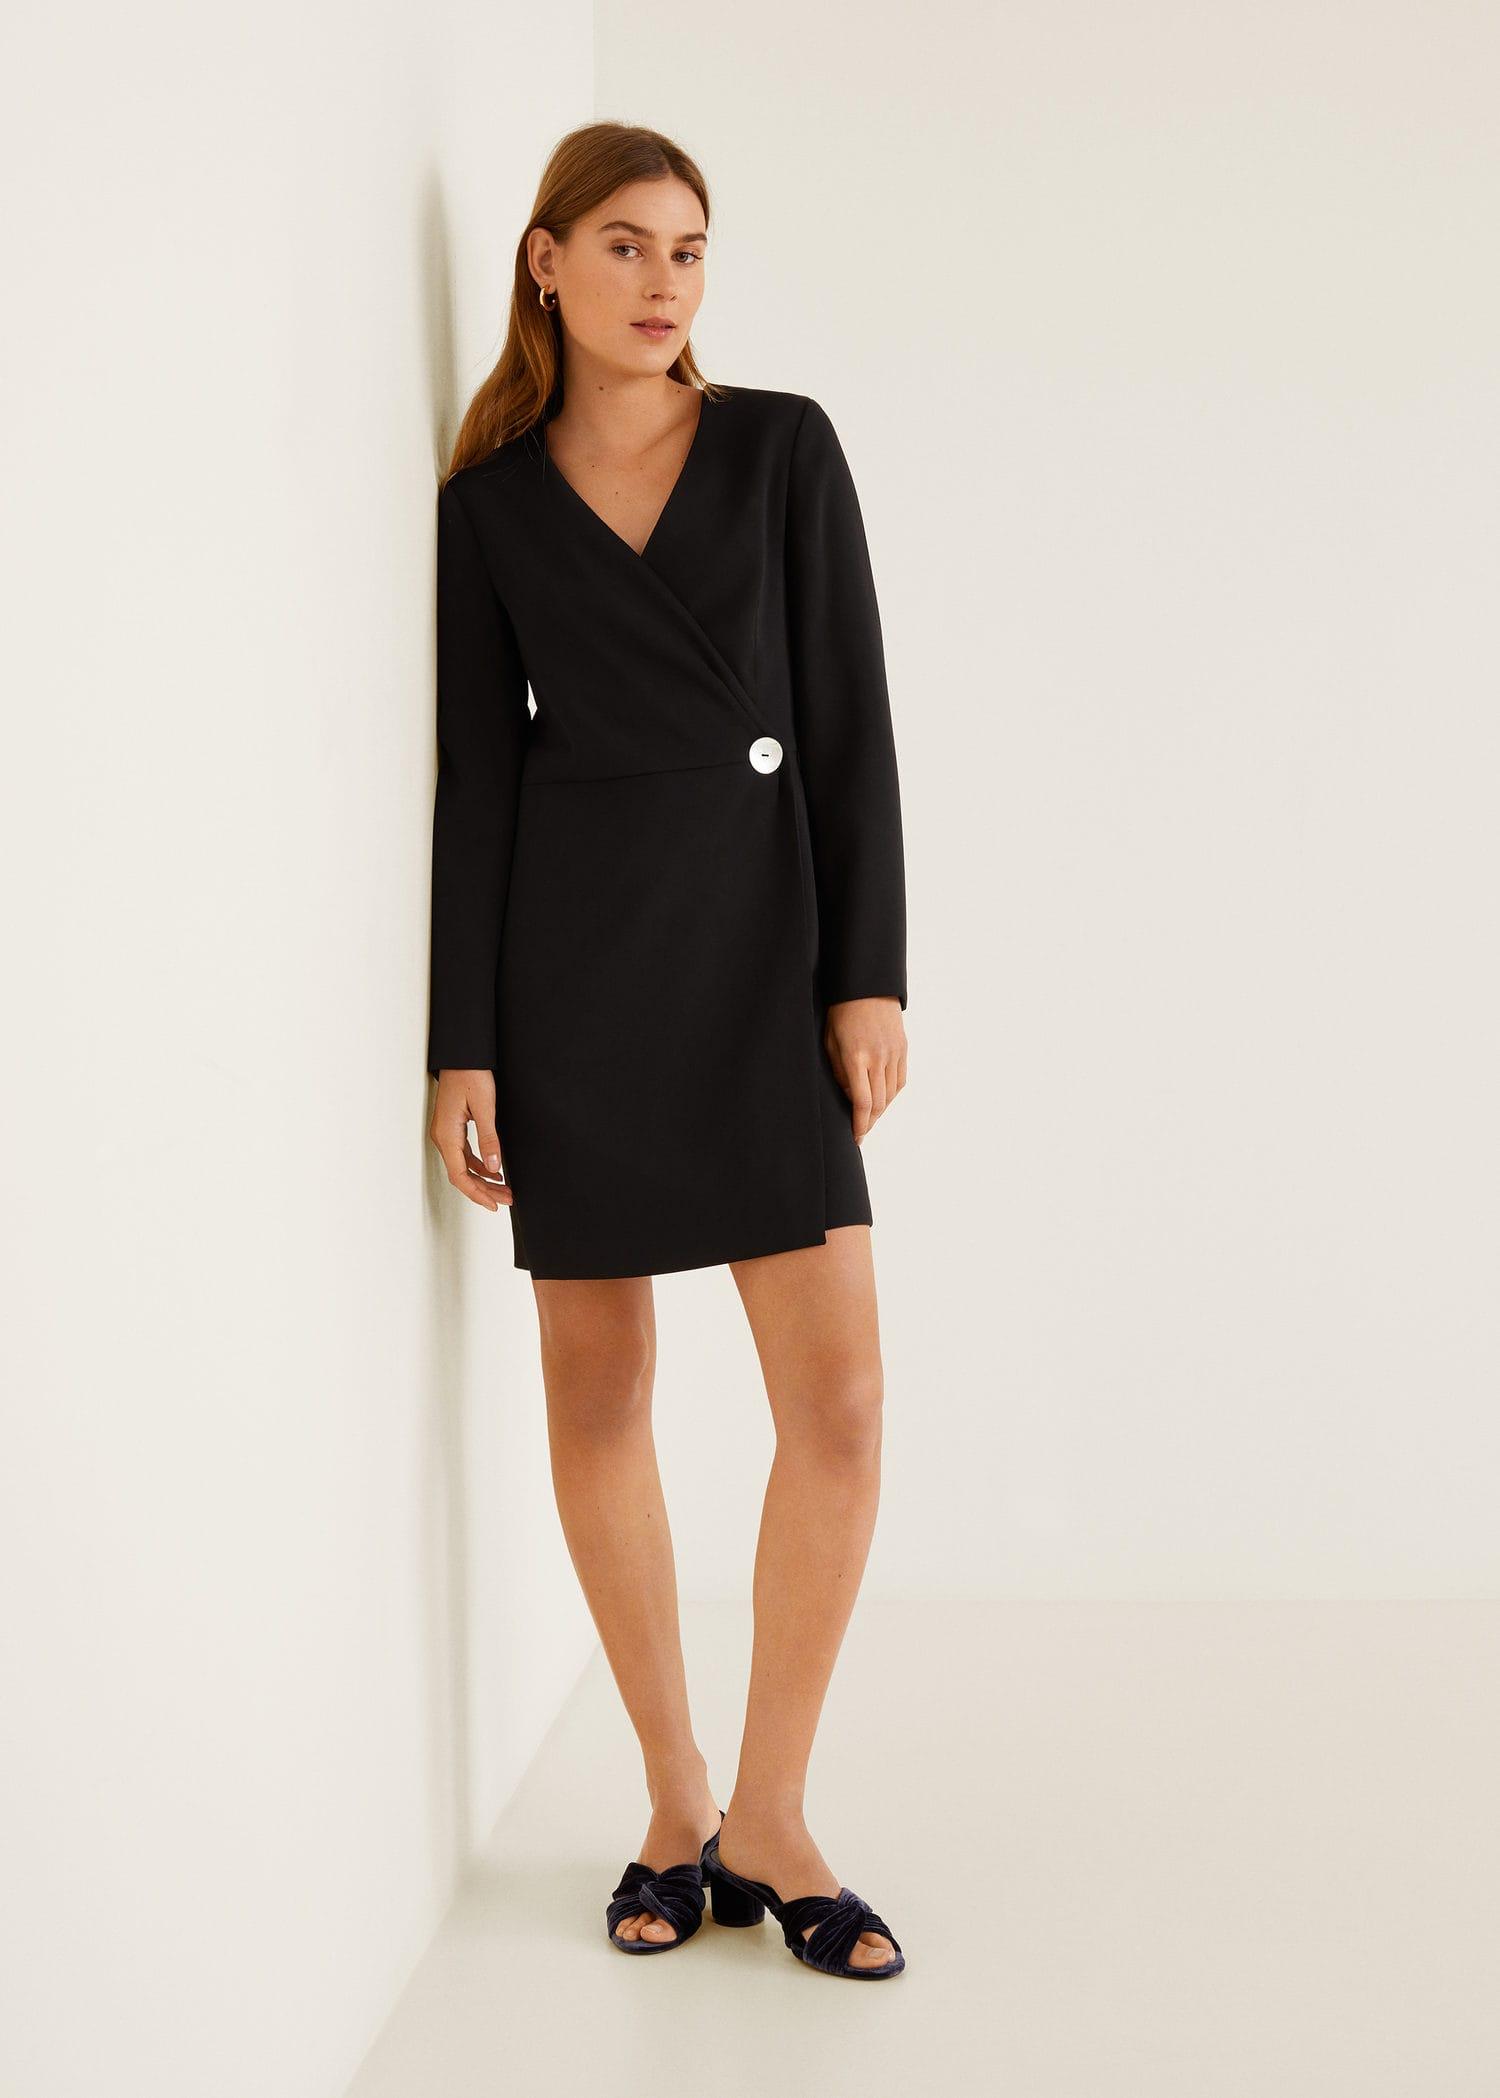 8be62d54c1ab Robes 2019 France Mango Femme Pour rrxOEqRA